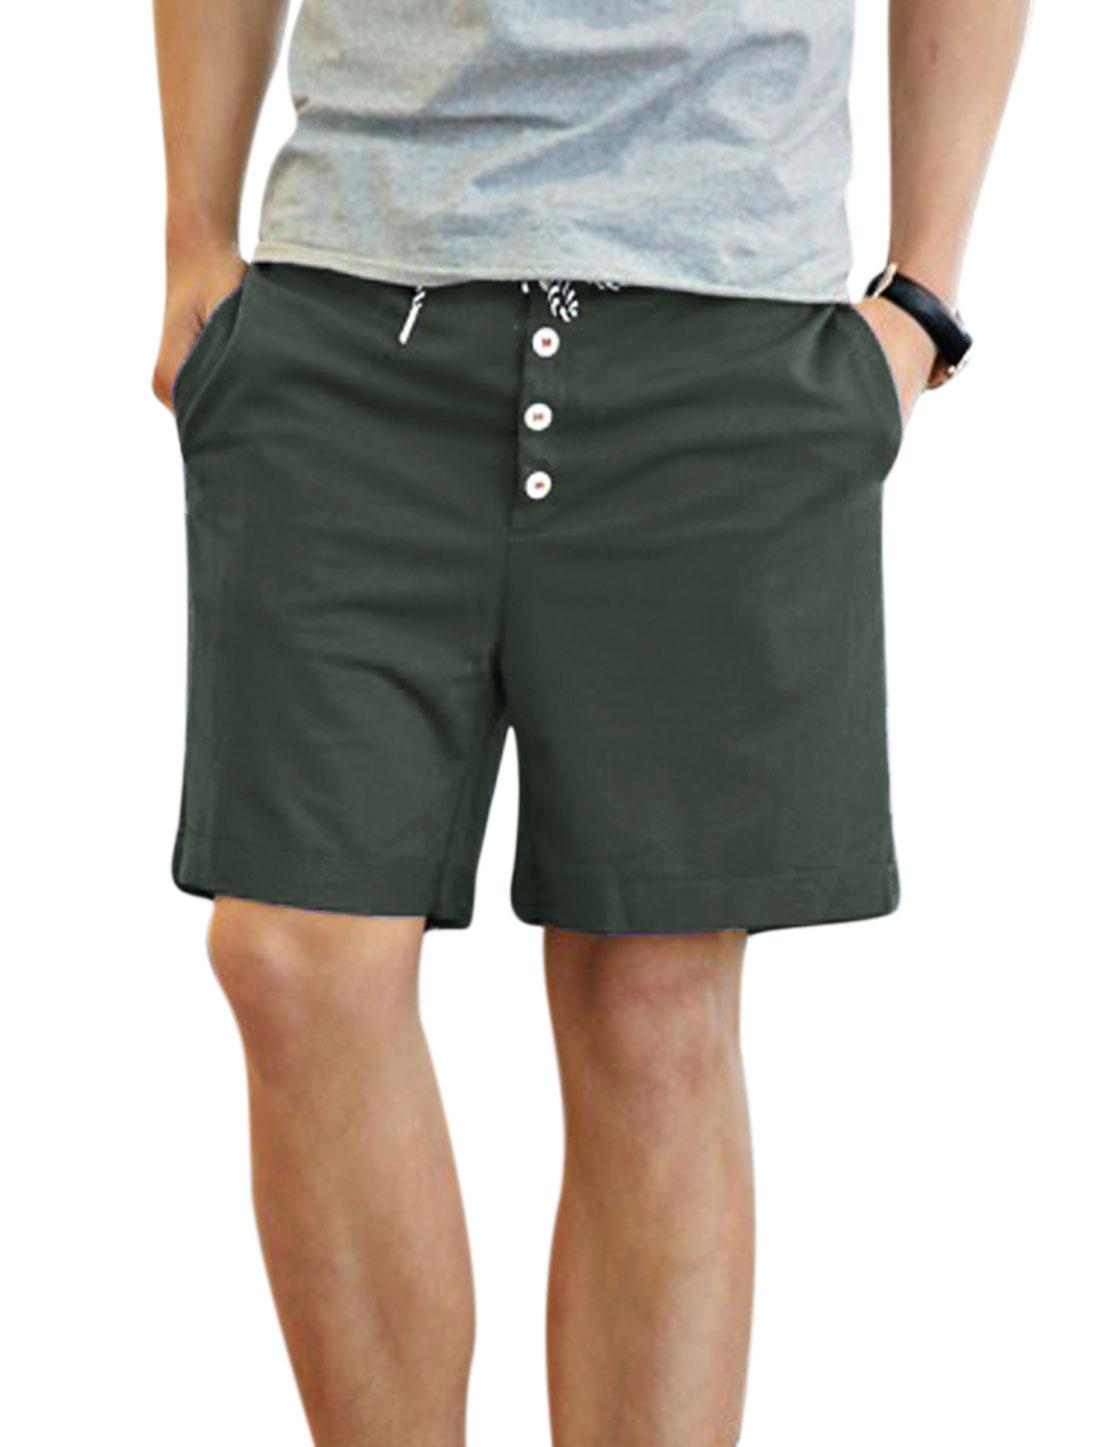 Men Drawstring Stretchy Waist Mid Rise Buttons Decor Short Pants Cool Gray W30